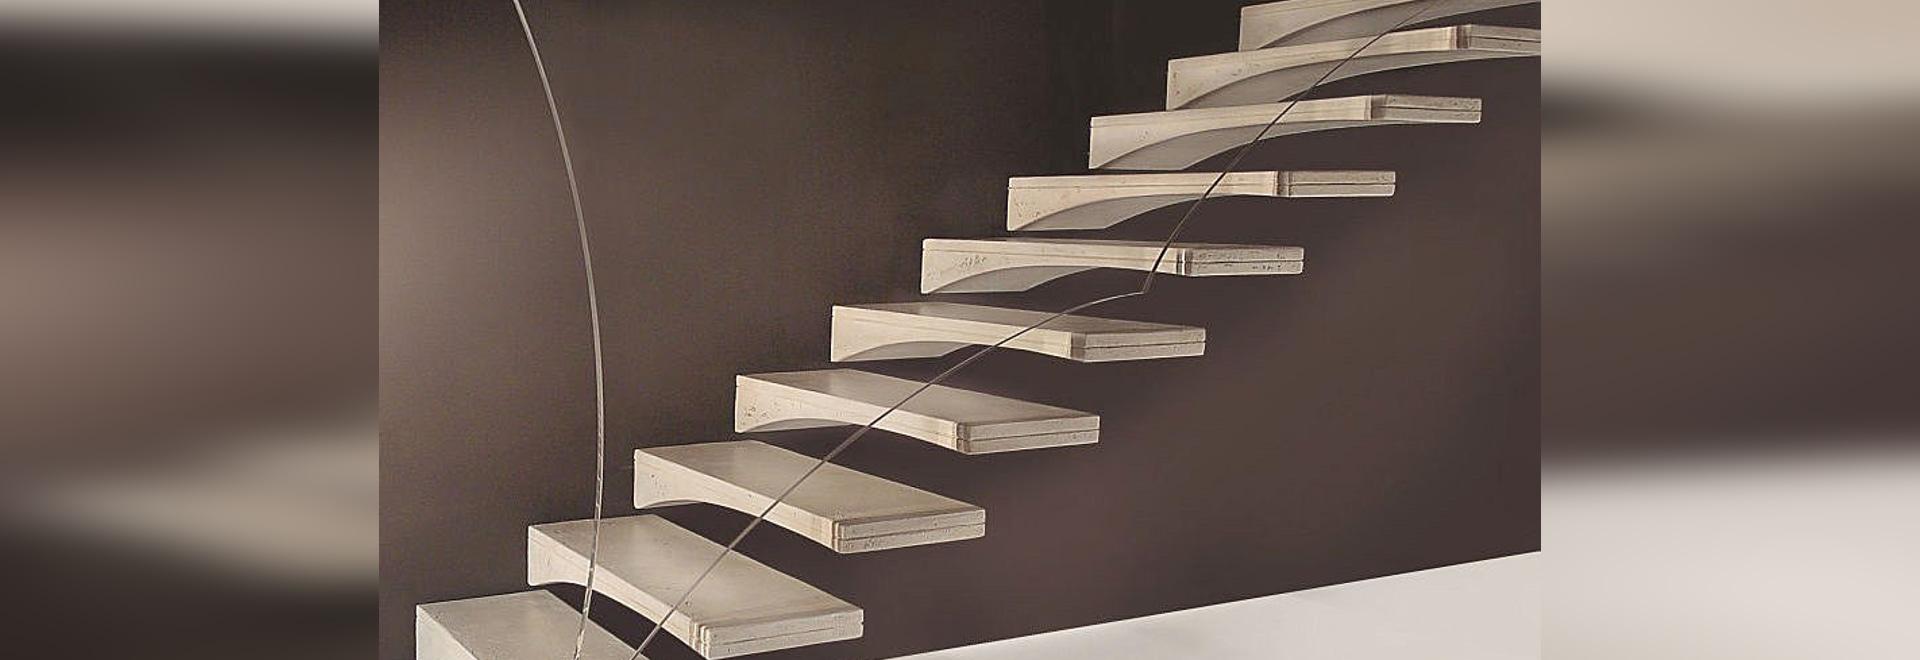 Freitragende Treppe freitragende treppe möwenflügel marretti